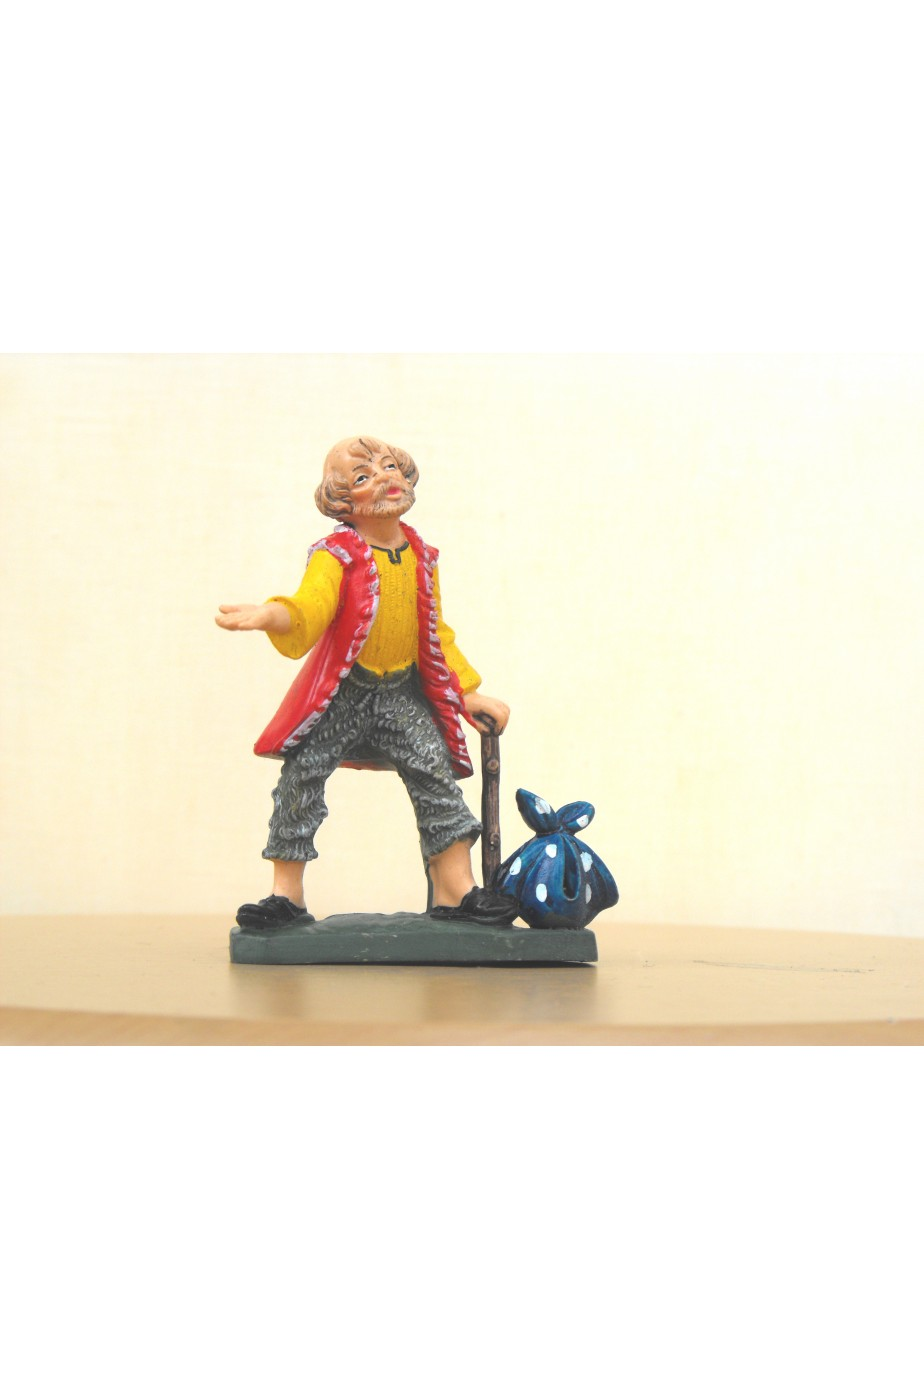 Figurina Presepe in plastica (cm 7 o 10 s.q.) Mendicante